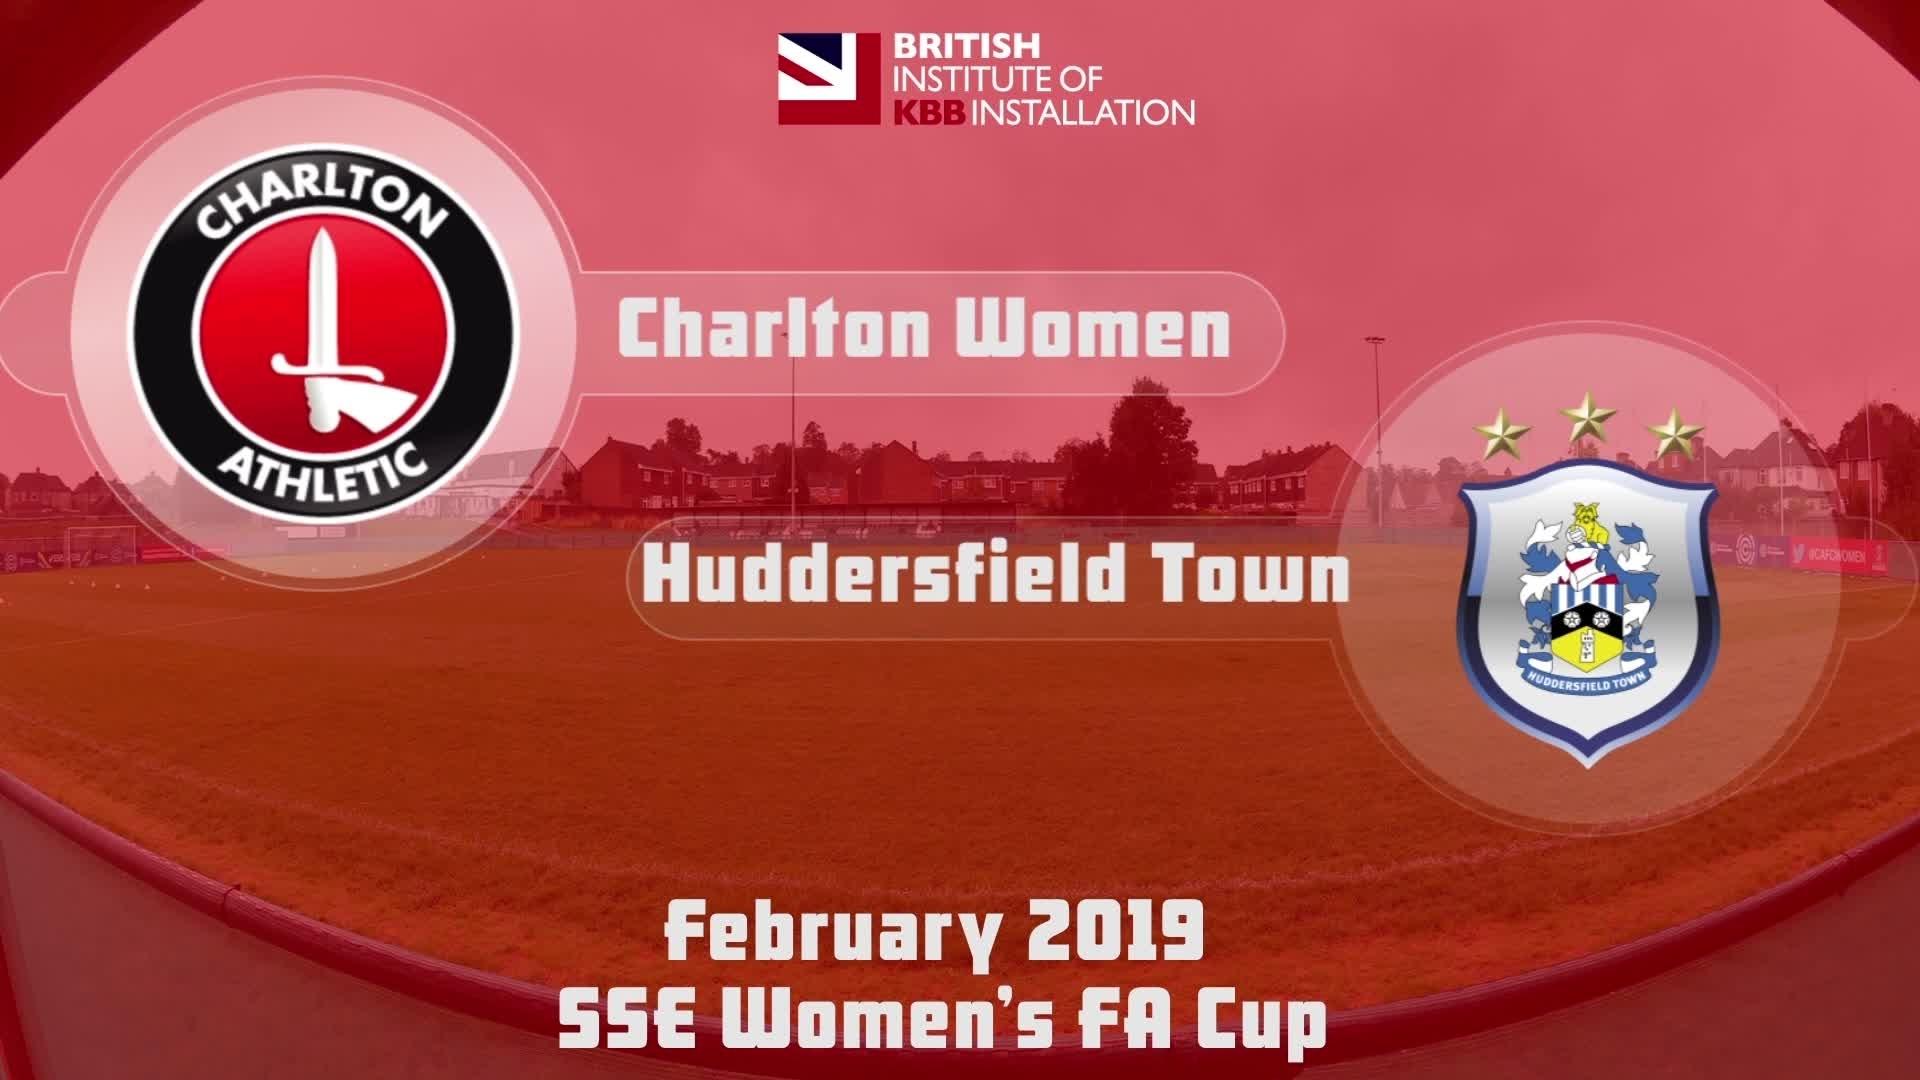 WOMEN'S HIGHLIGHTS | Charlton Women 3 Huddersfield 3 (Women's FA Cup Feb 2019)